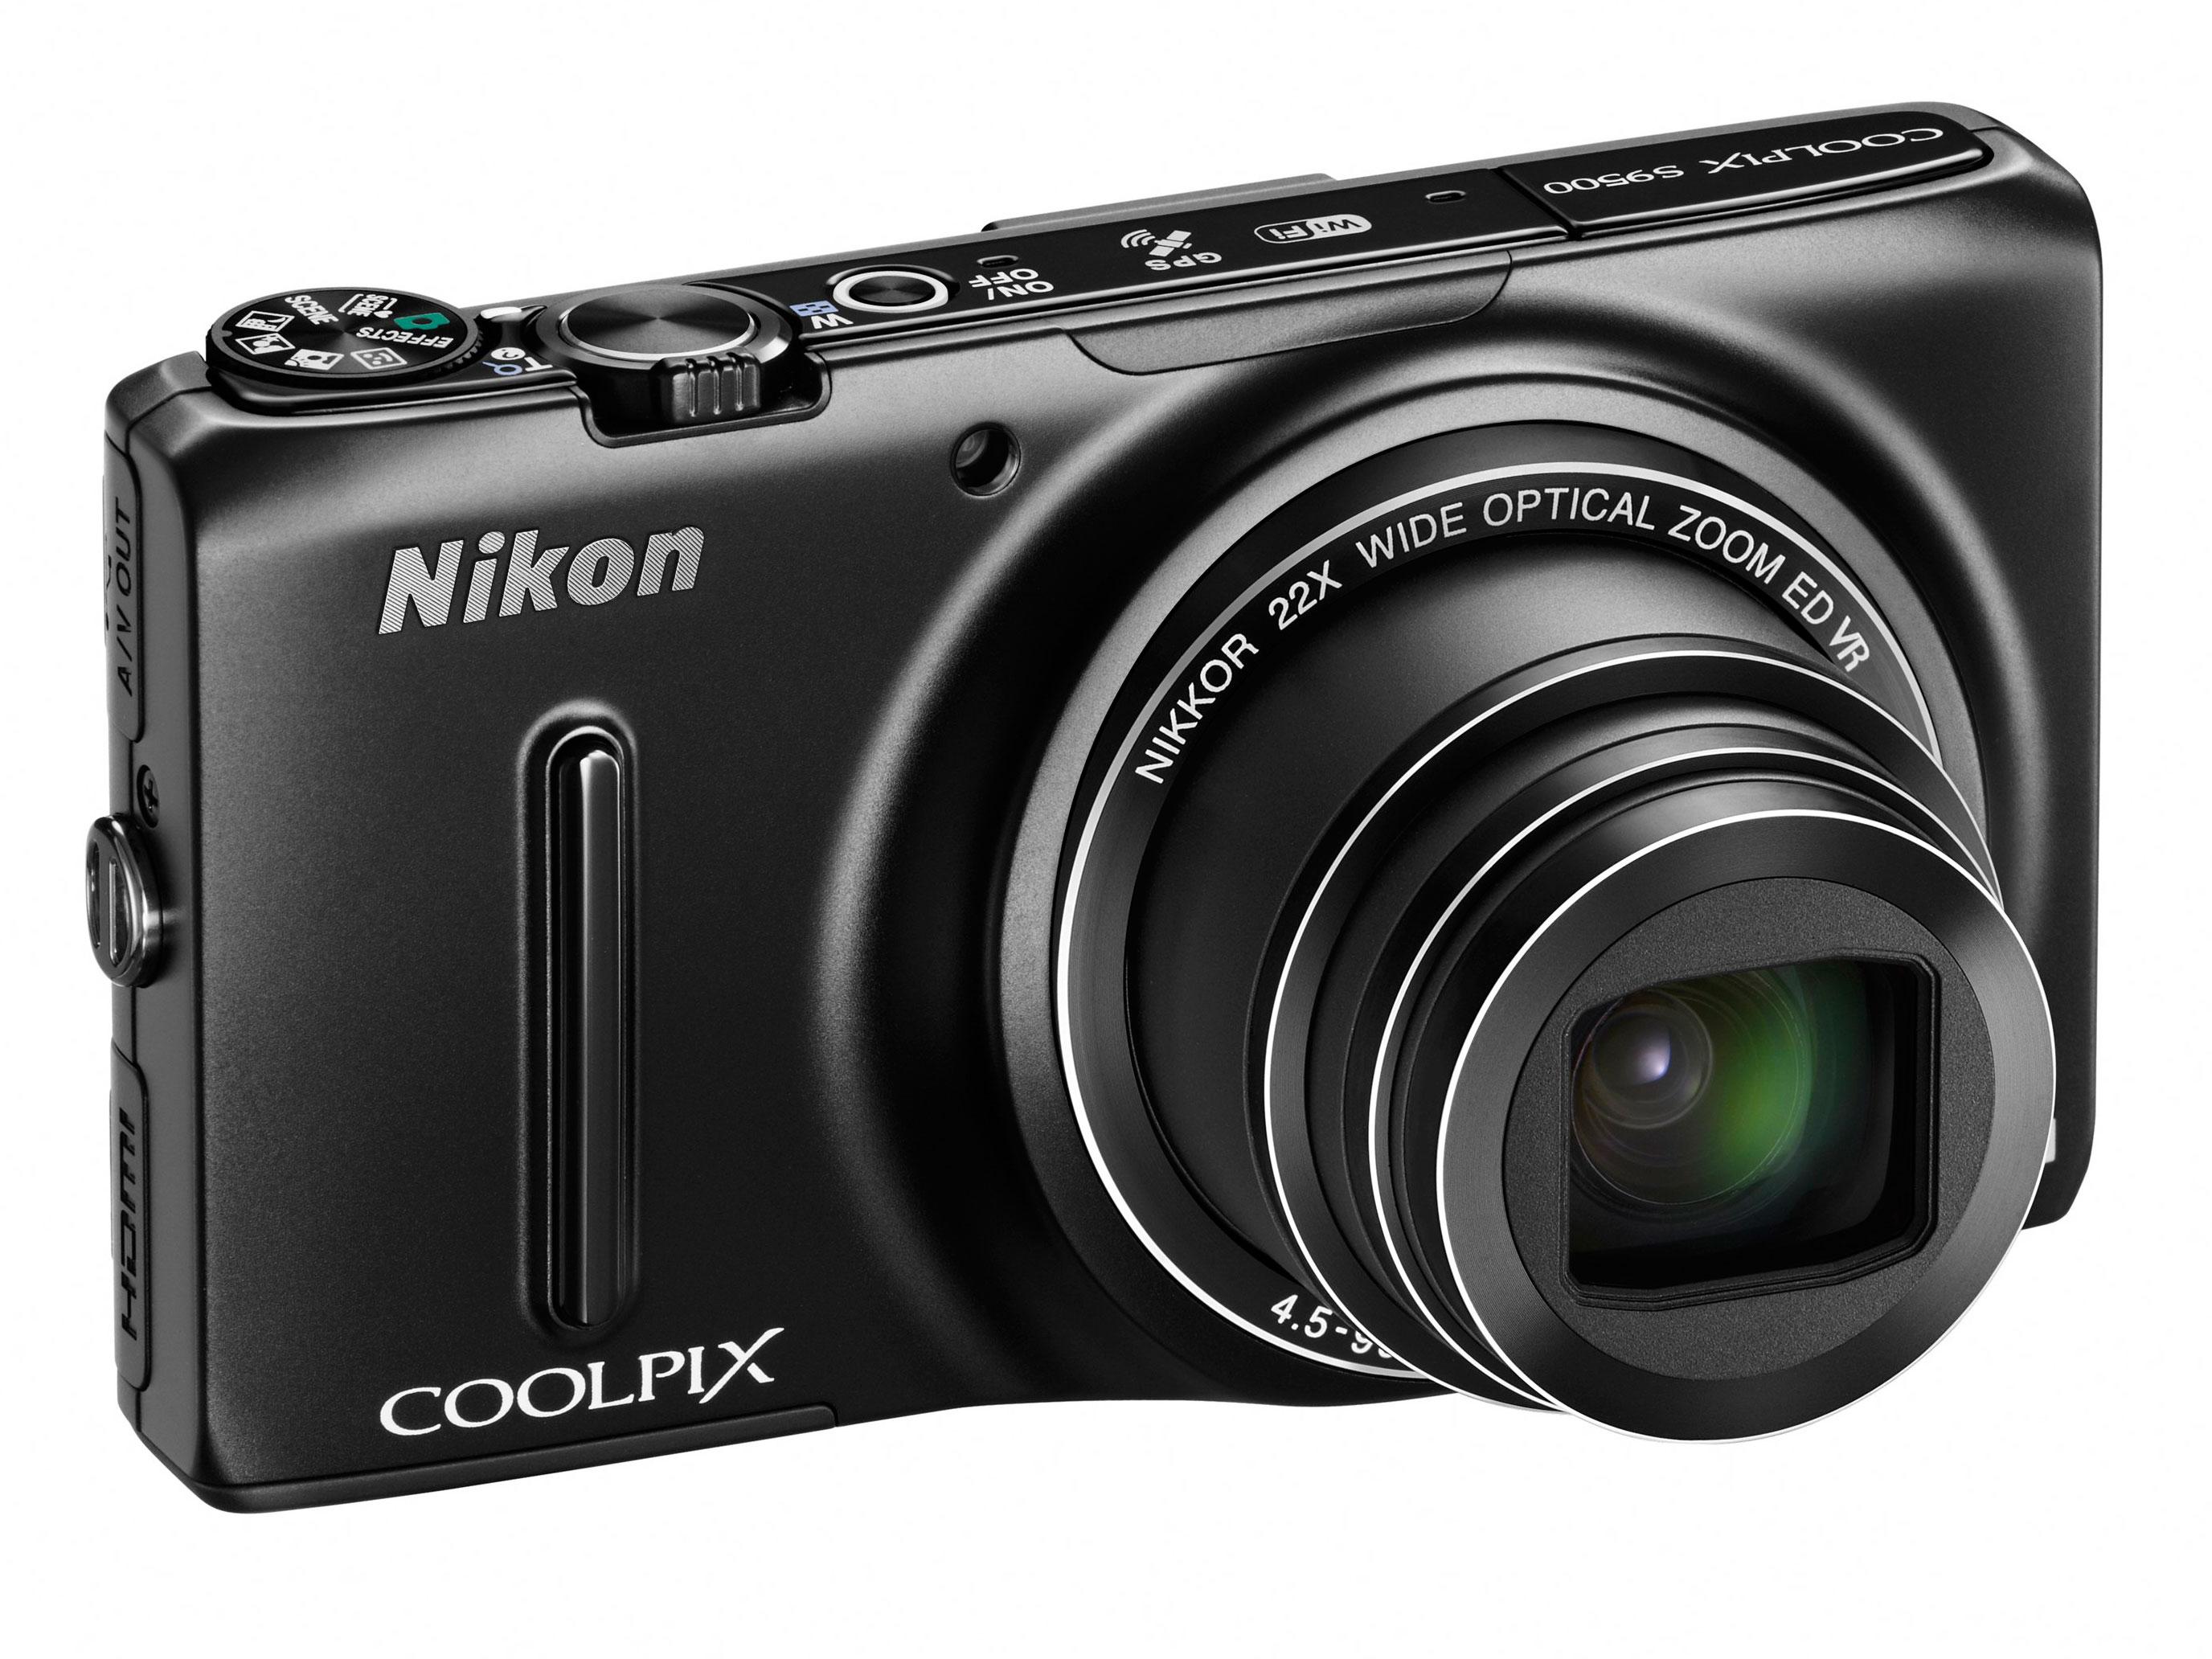 Fancy Pixcameras Make Capturing Action At A Distance Easy Nikon Debuts Pix With Zoom New Compacts Nikon Pix L820 Wont Turn On Nikon Pix L820 Specs dpreview Nikon Coolpix L820